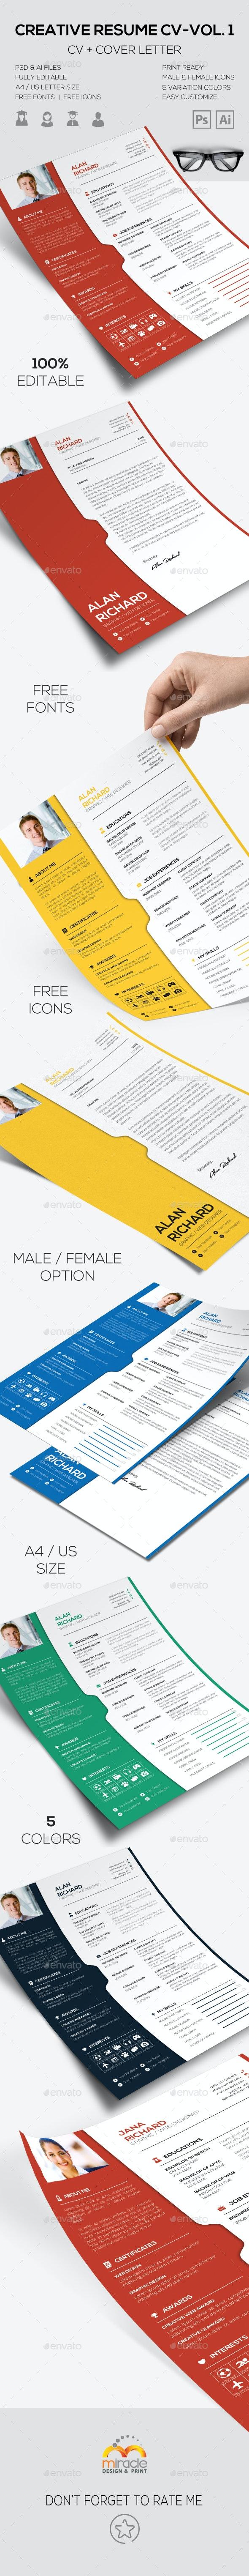 Creative Resume CV-Vol 1 - Resumes Stationery